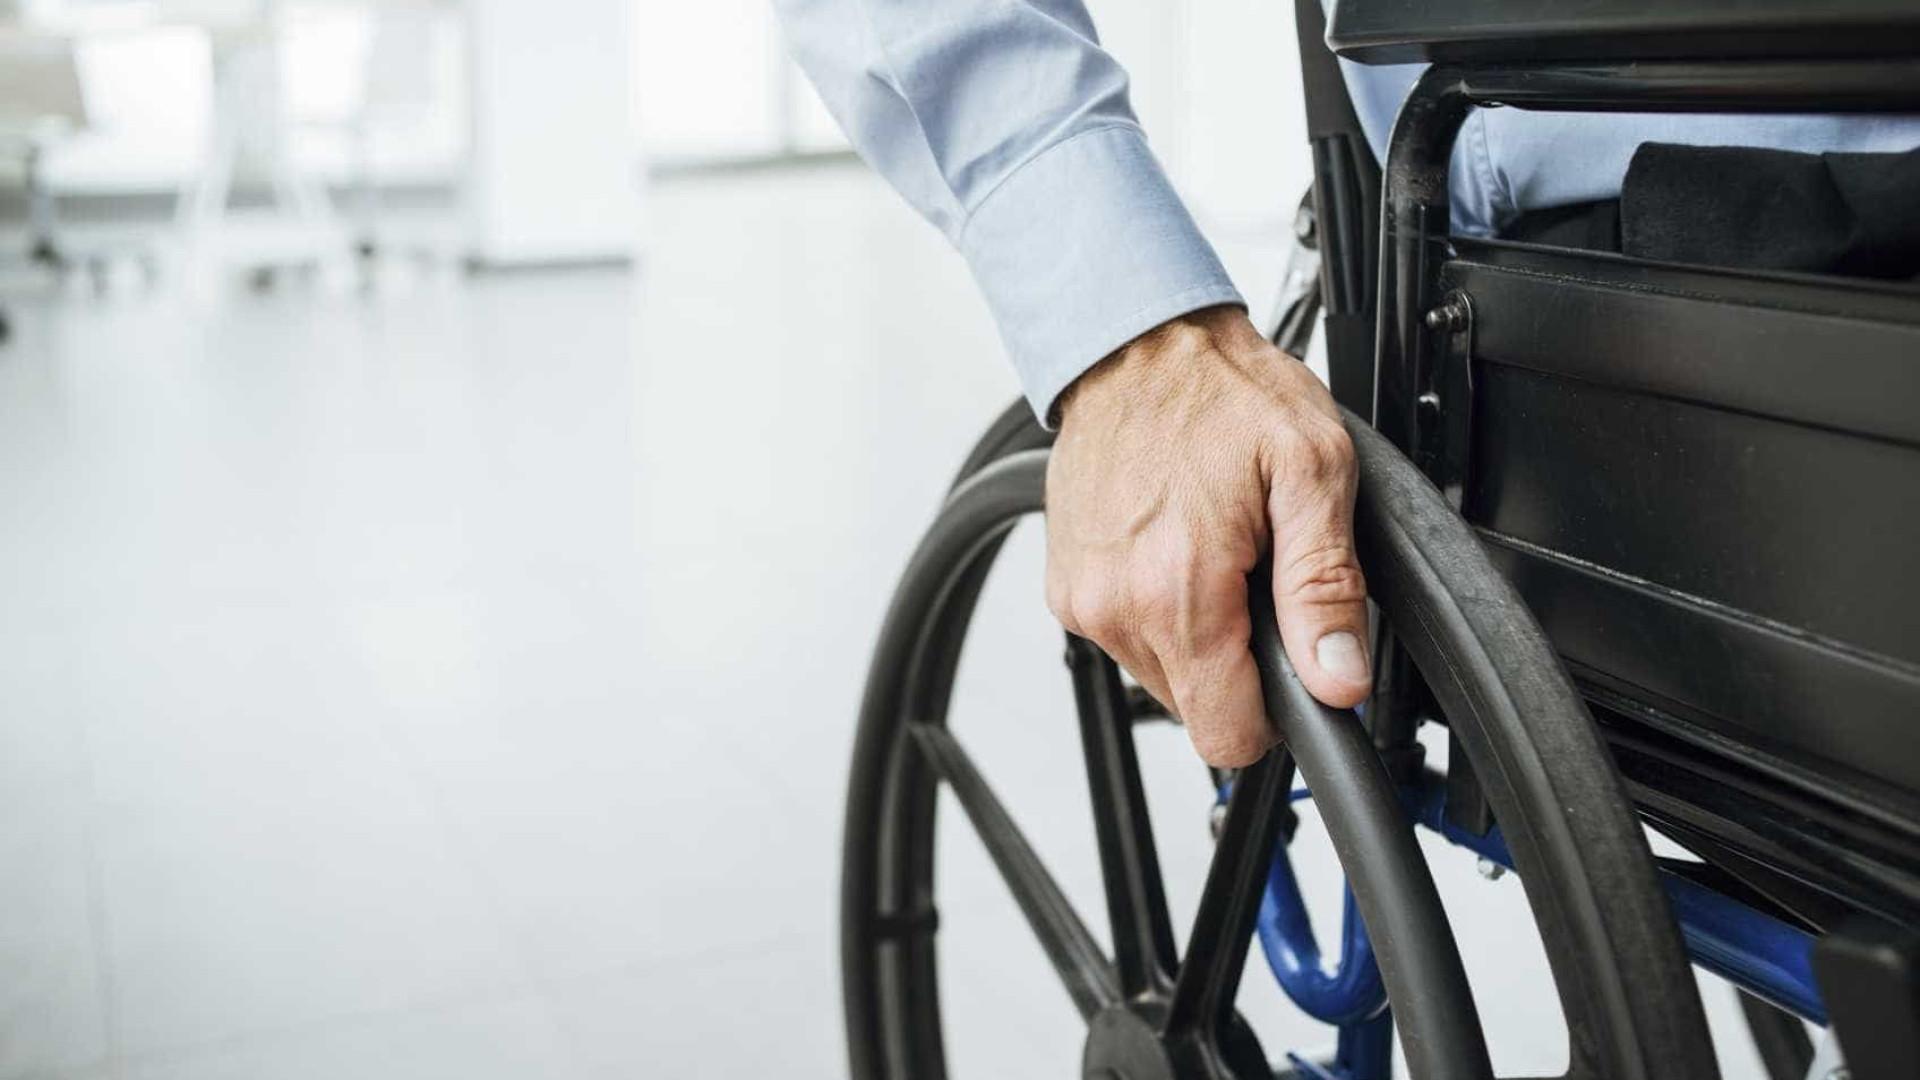 Cadeira de rodas inteligente que evita obstáculos apresentada domingo